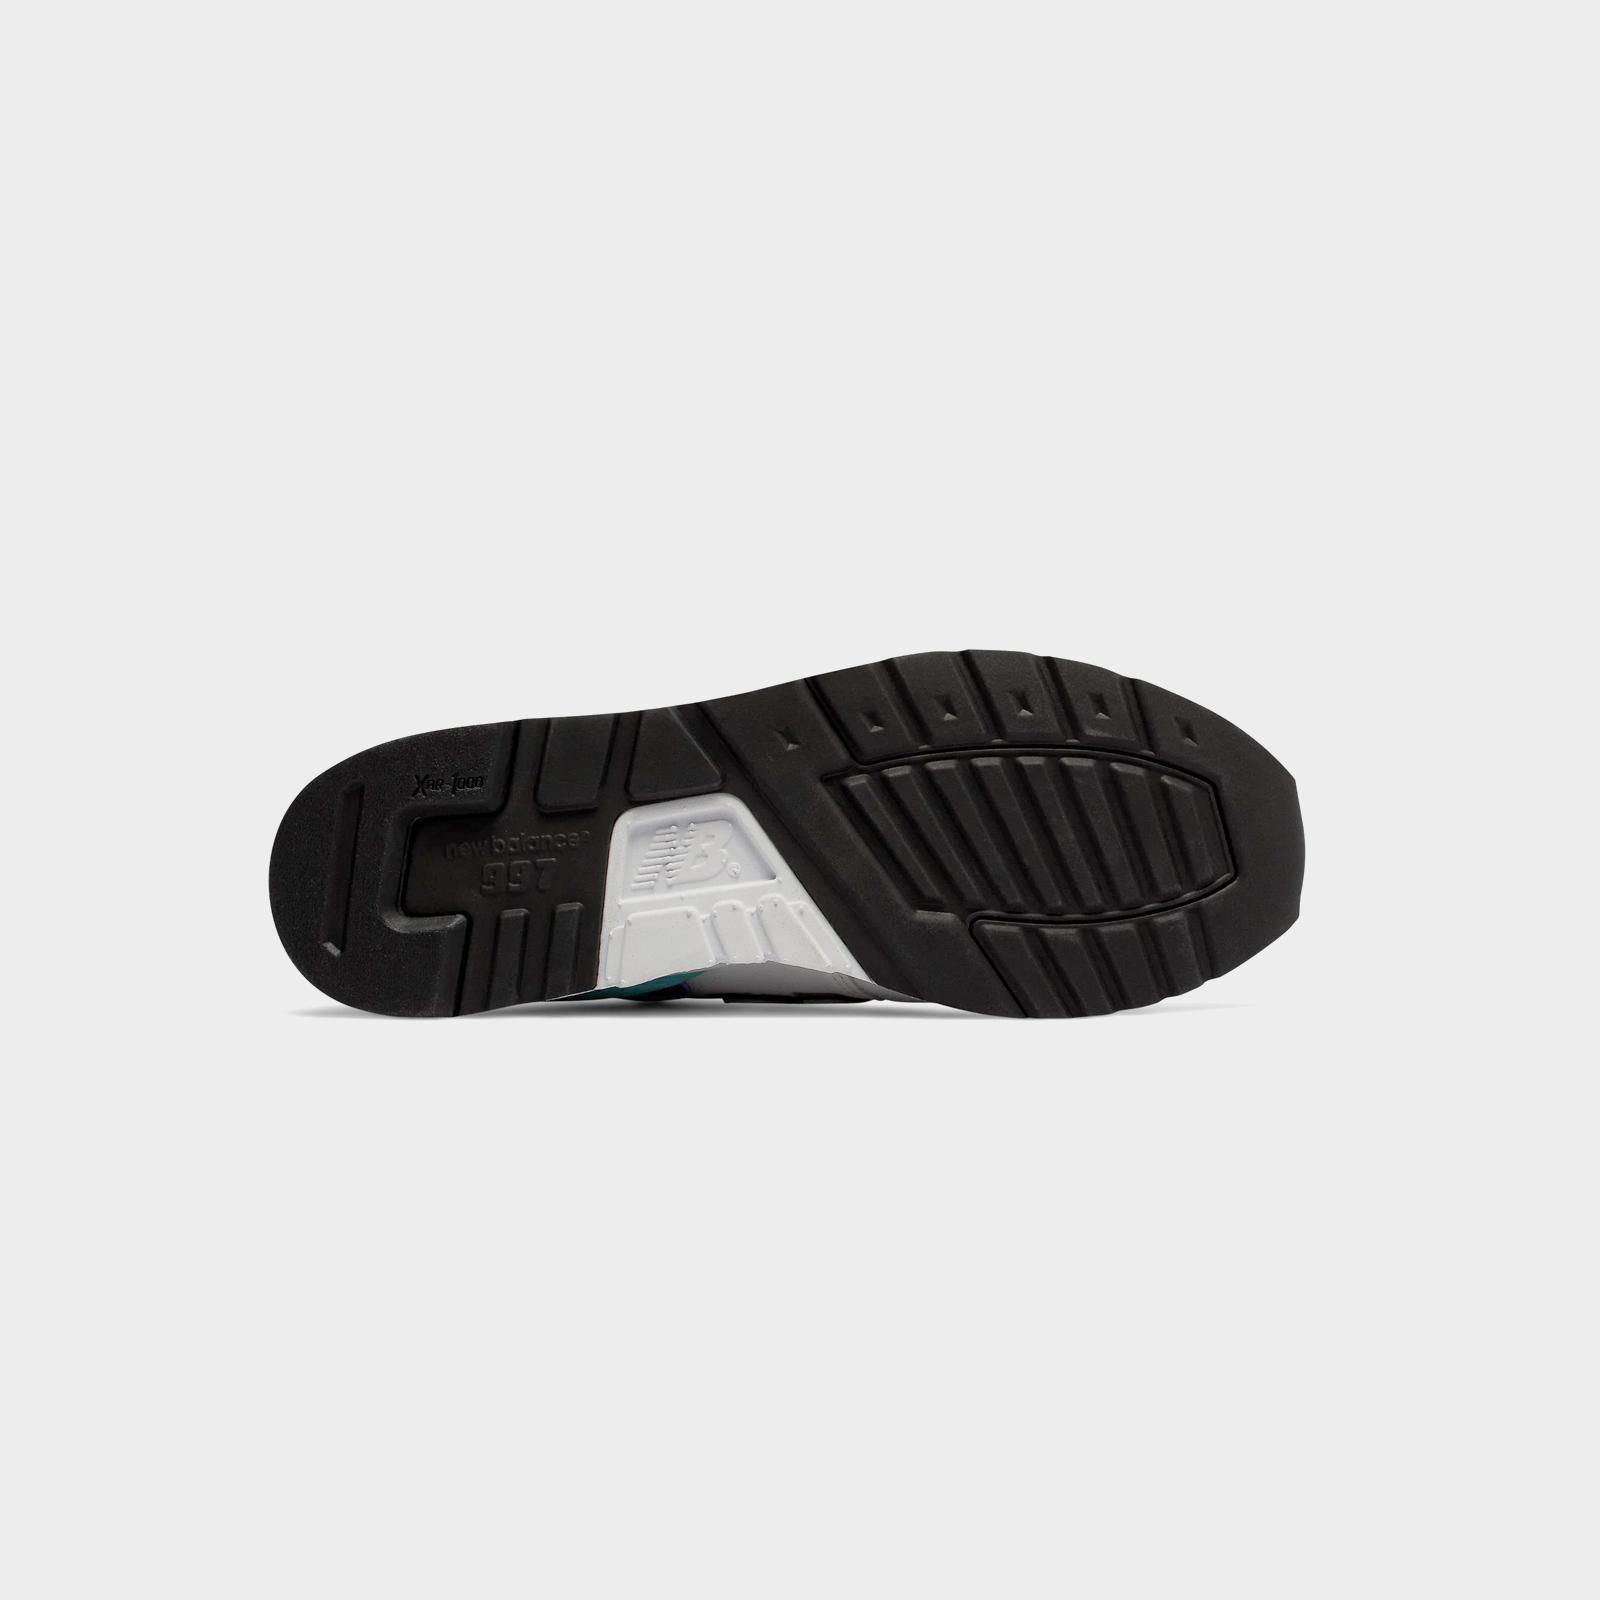 new product 3213d d241c New Balance M997 - M997wea - Sneakersnstuff | sneakers ...